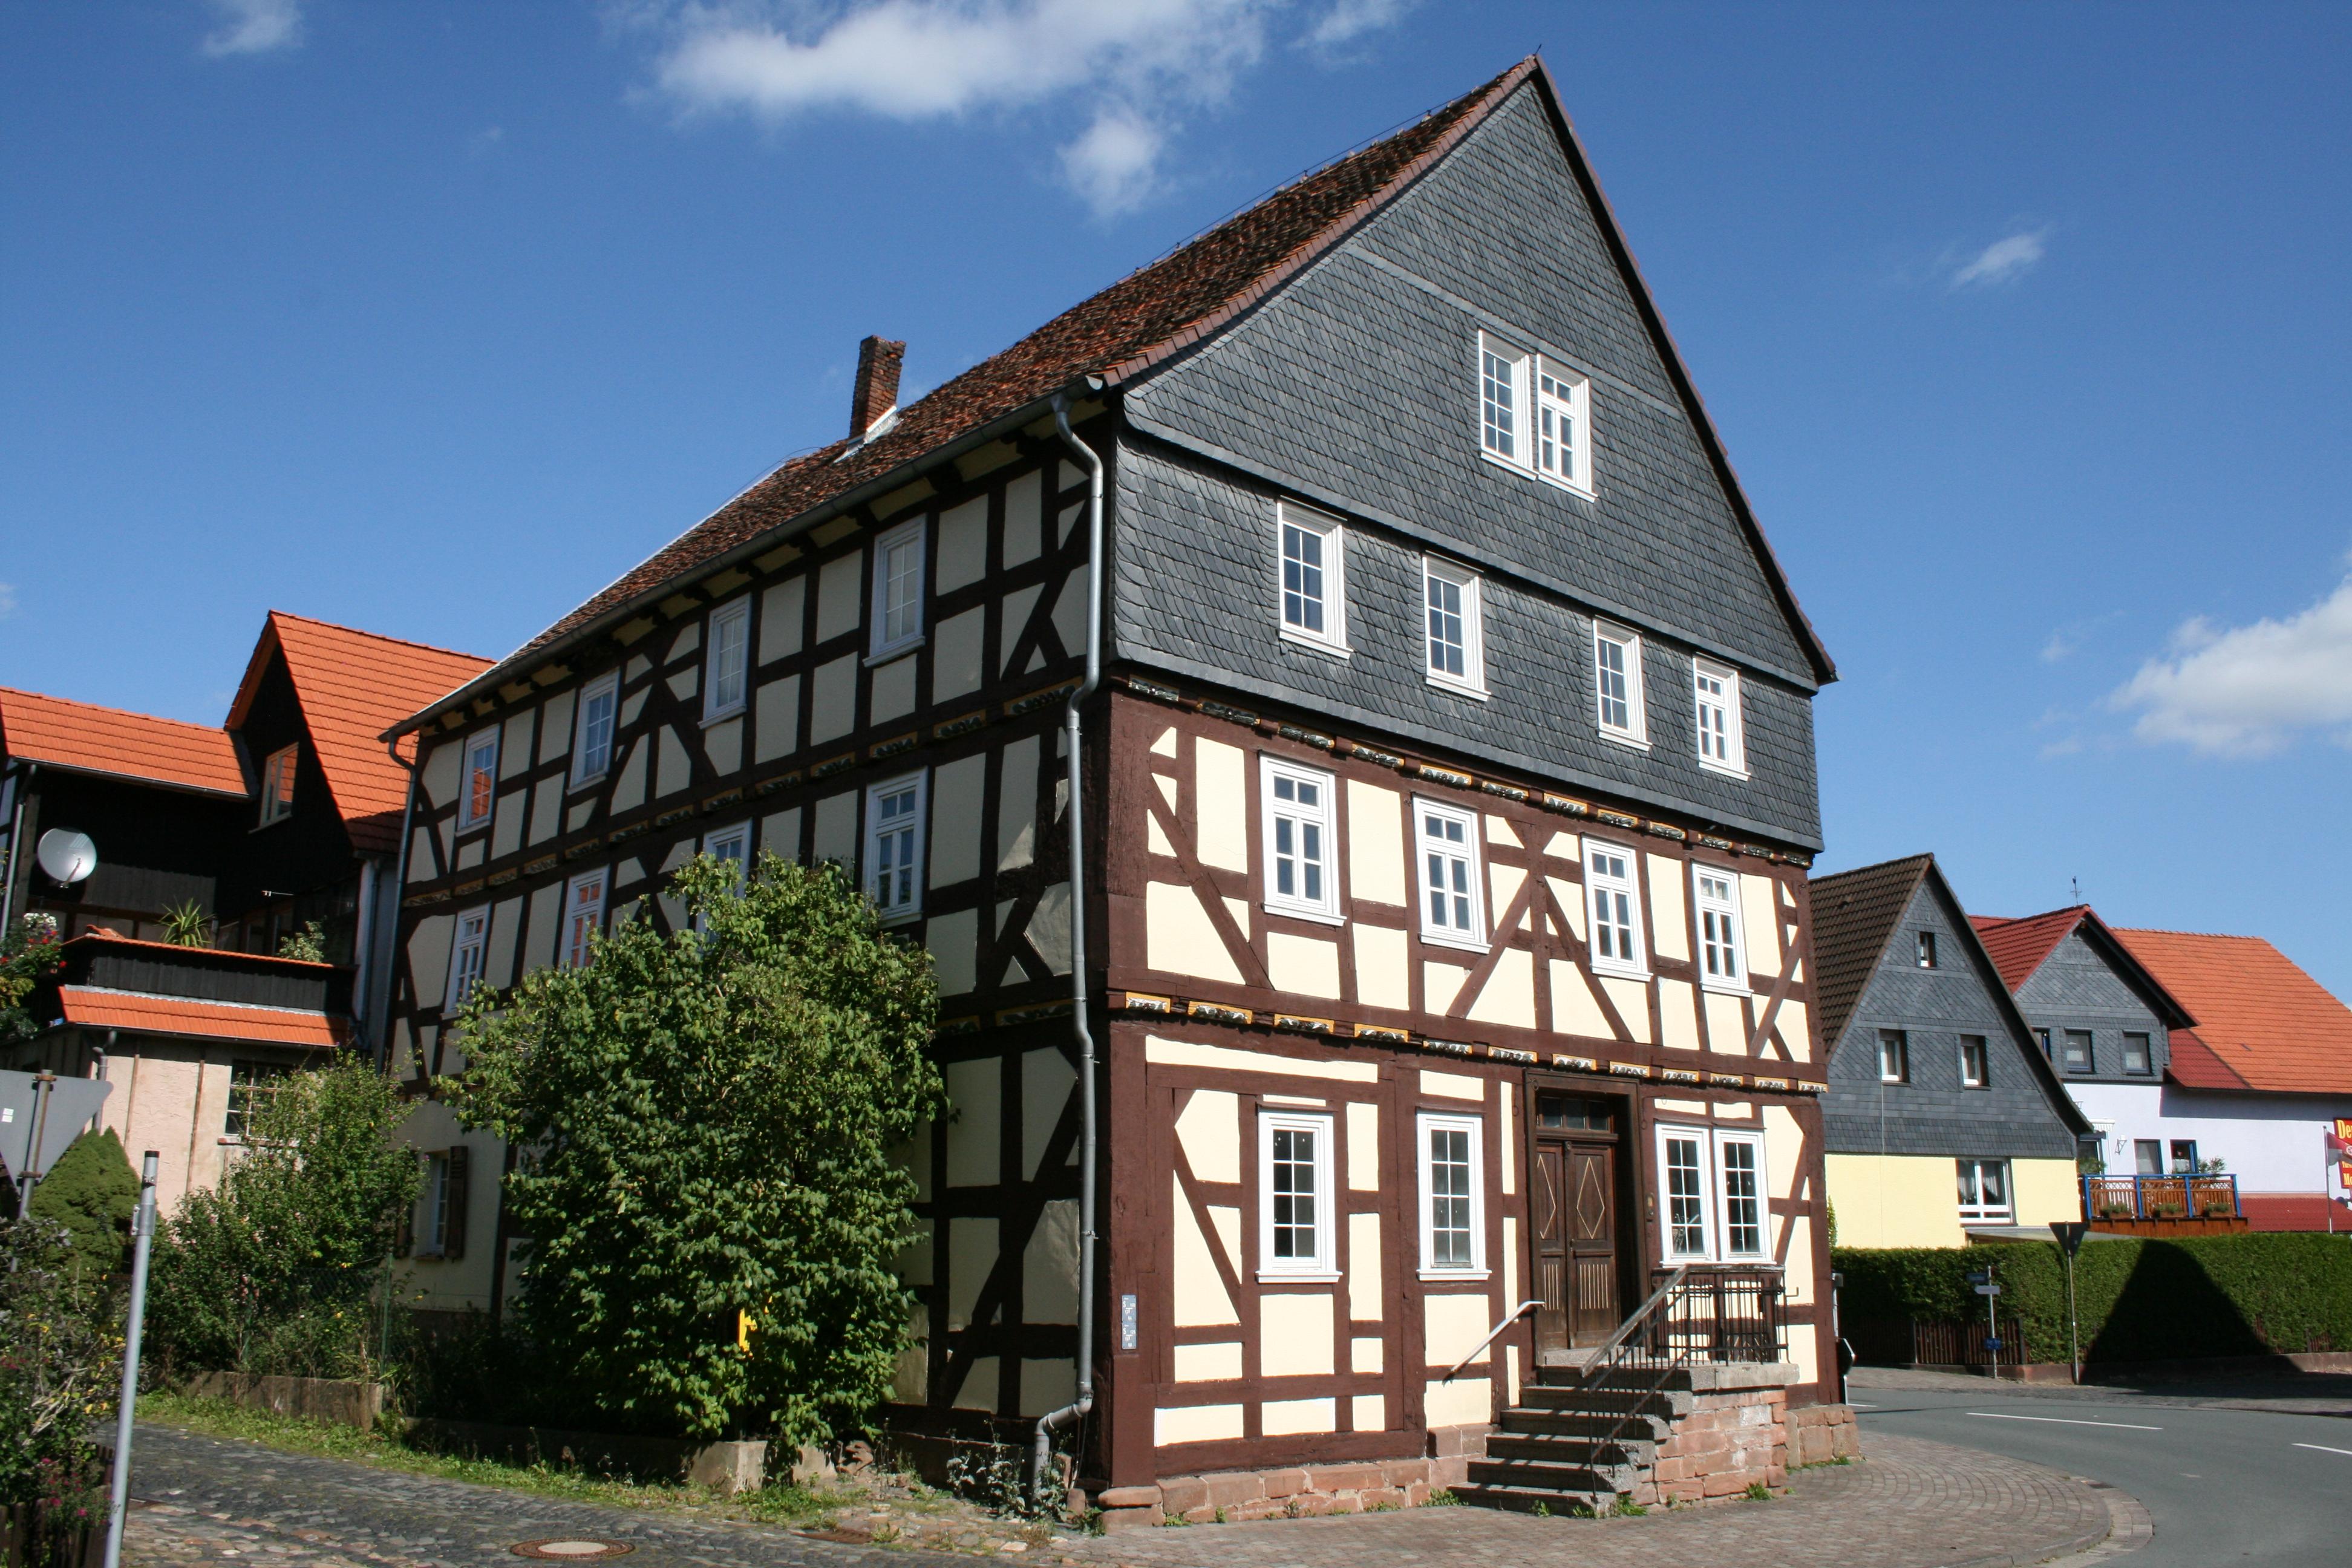 Rosenthal (Hessen)